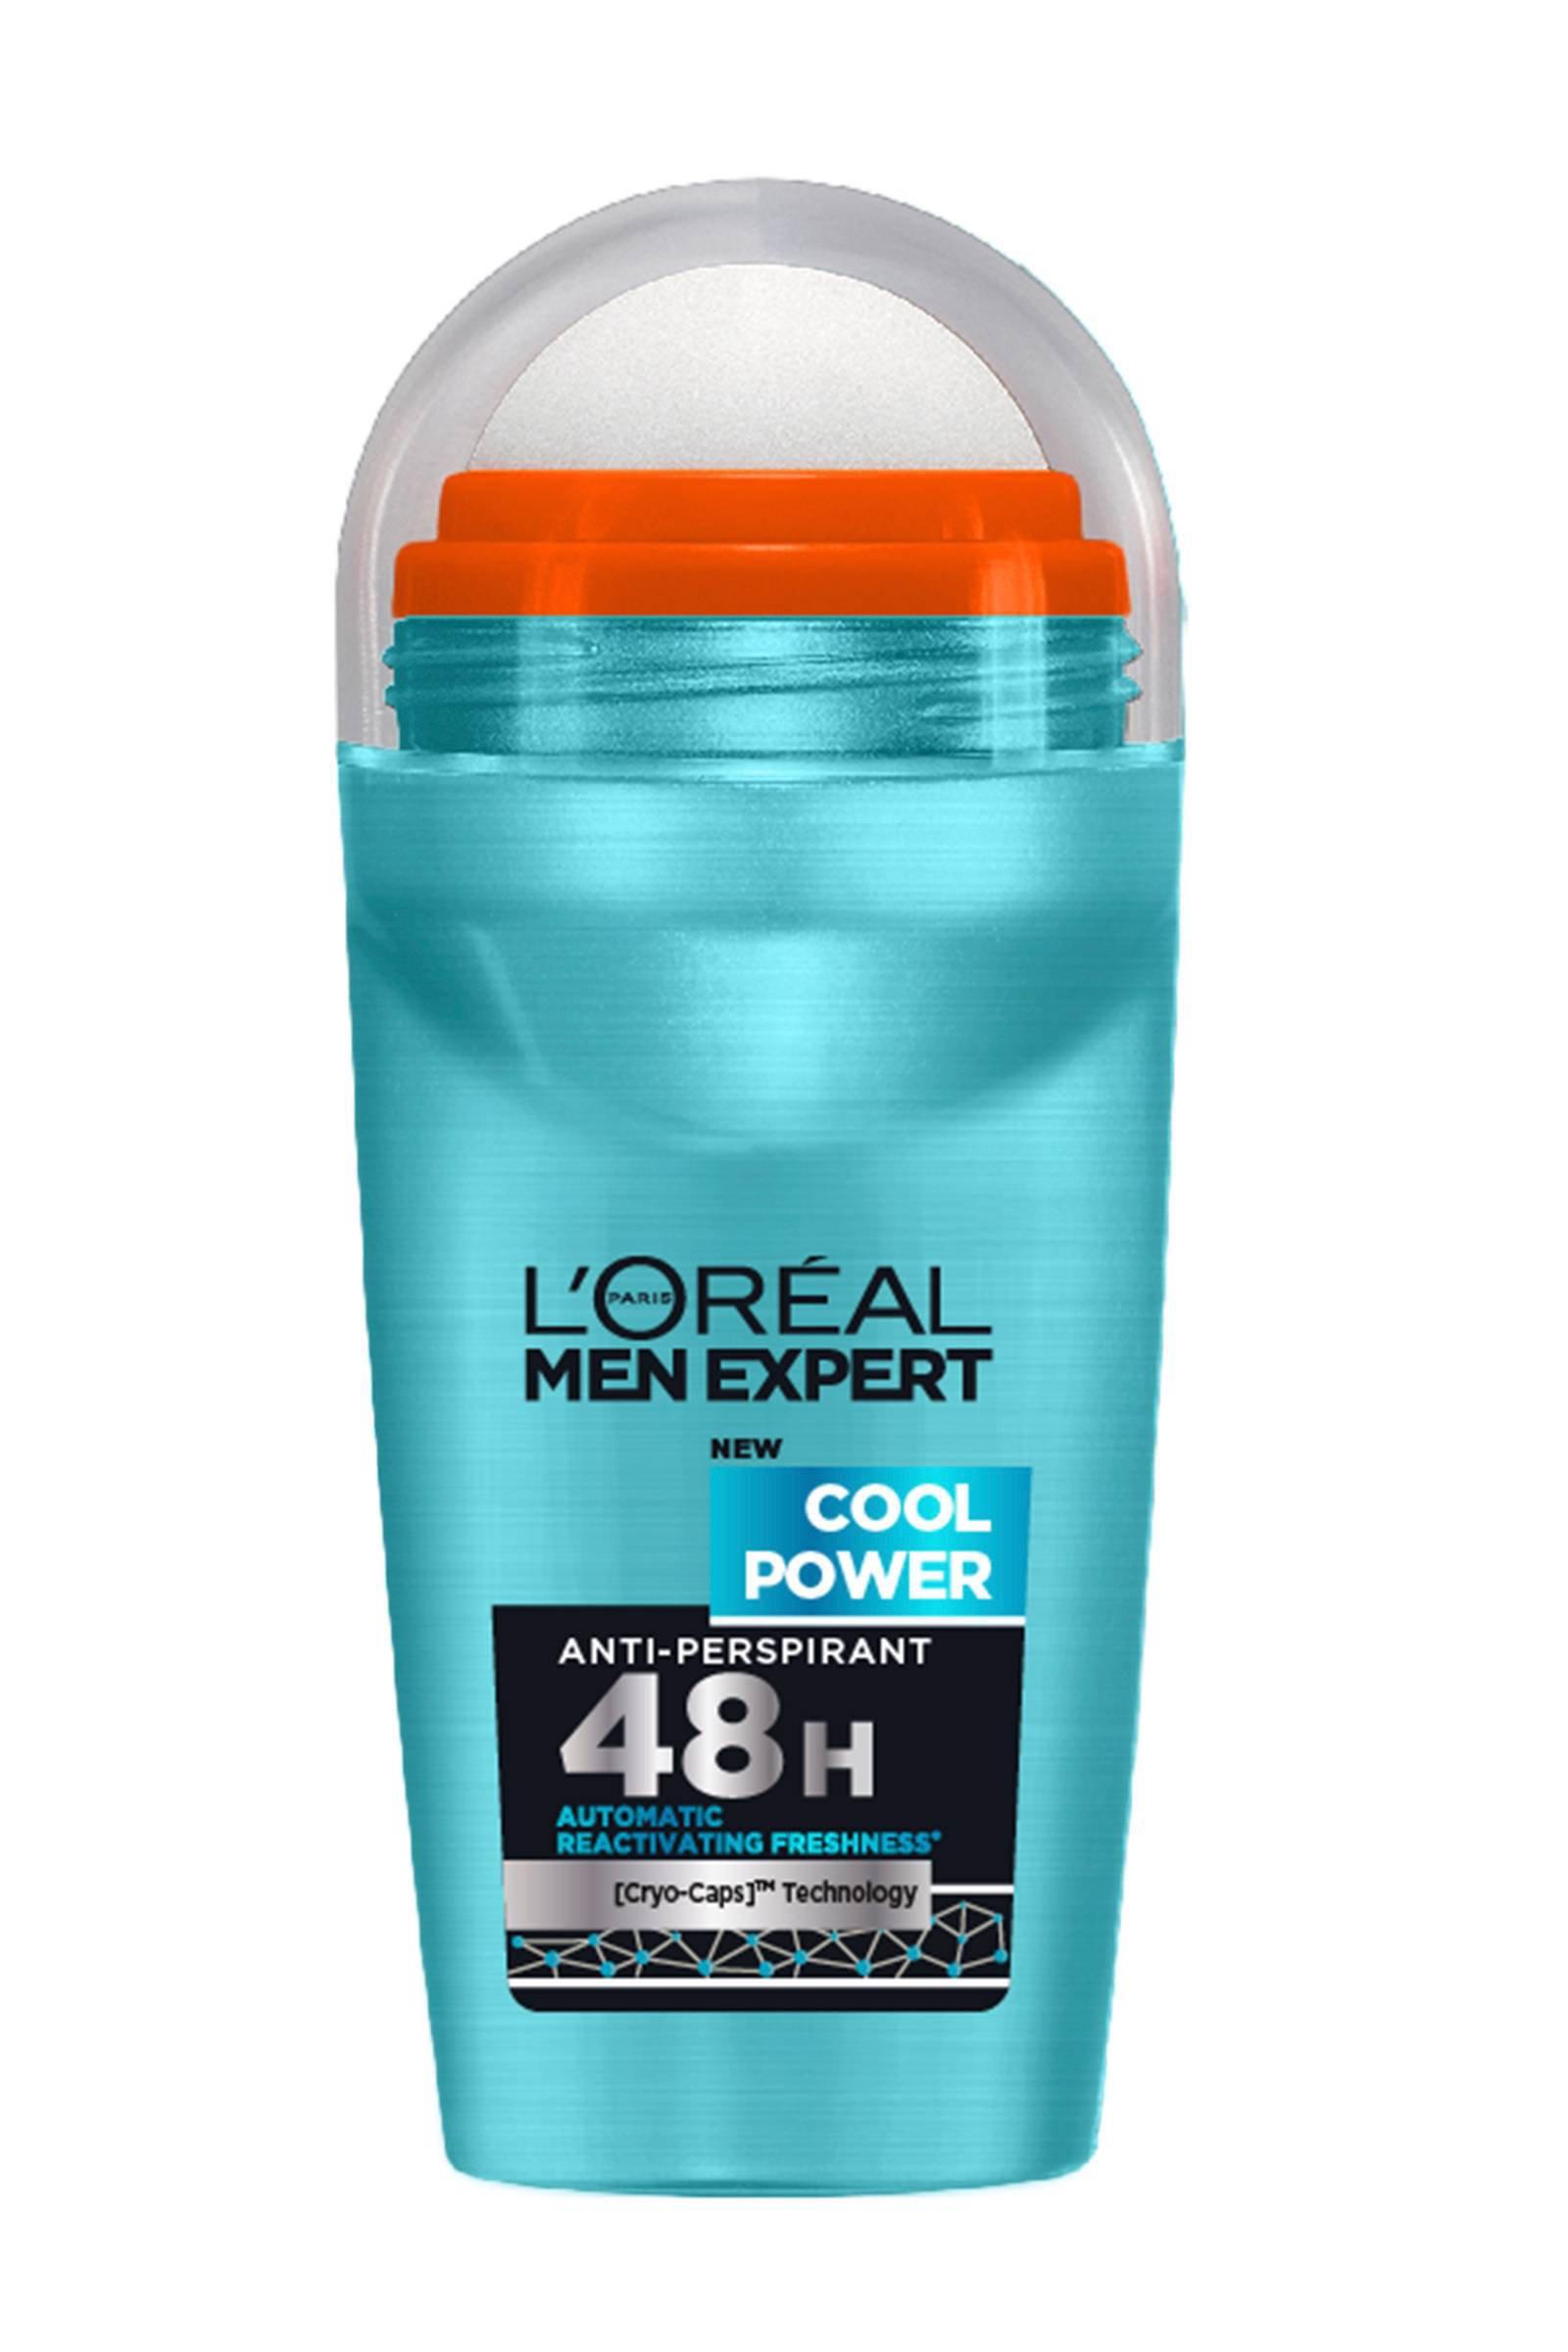 L'Oréal Paris Men Expert 48H Cool Power deodorant roller